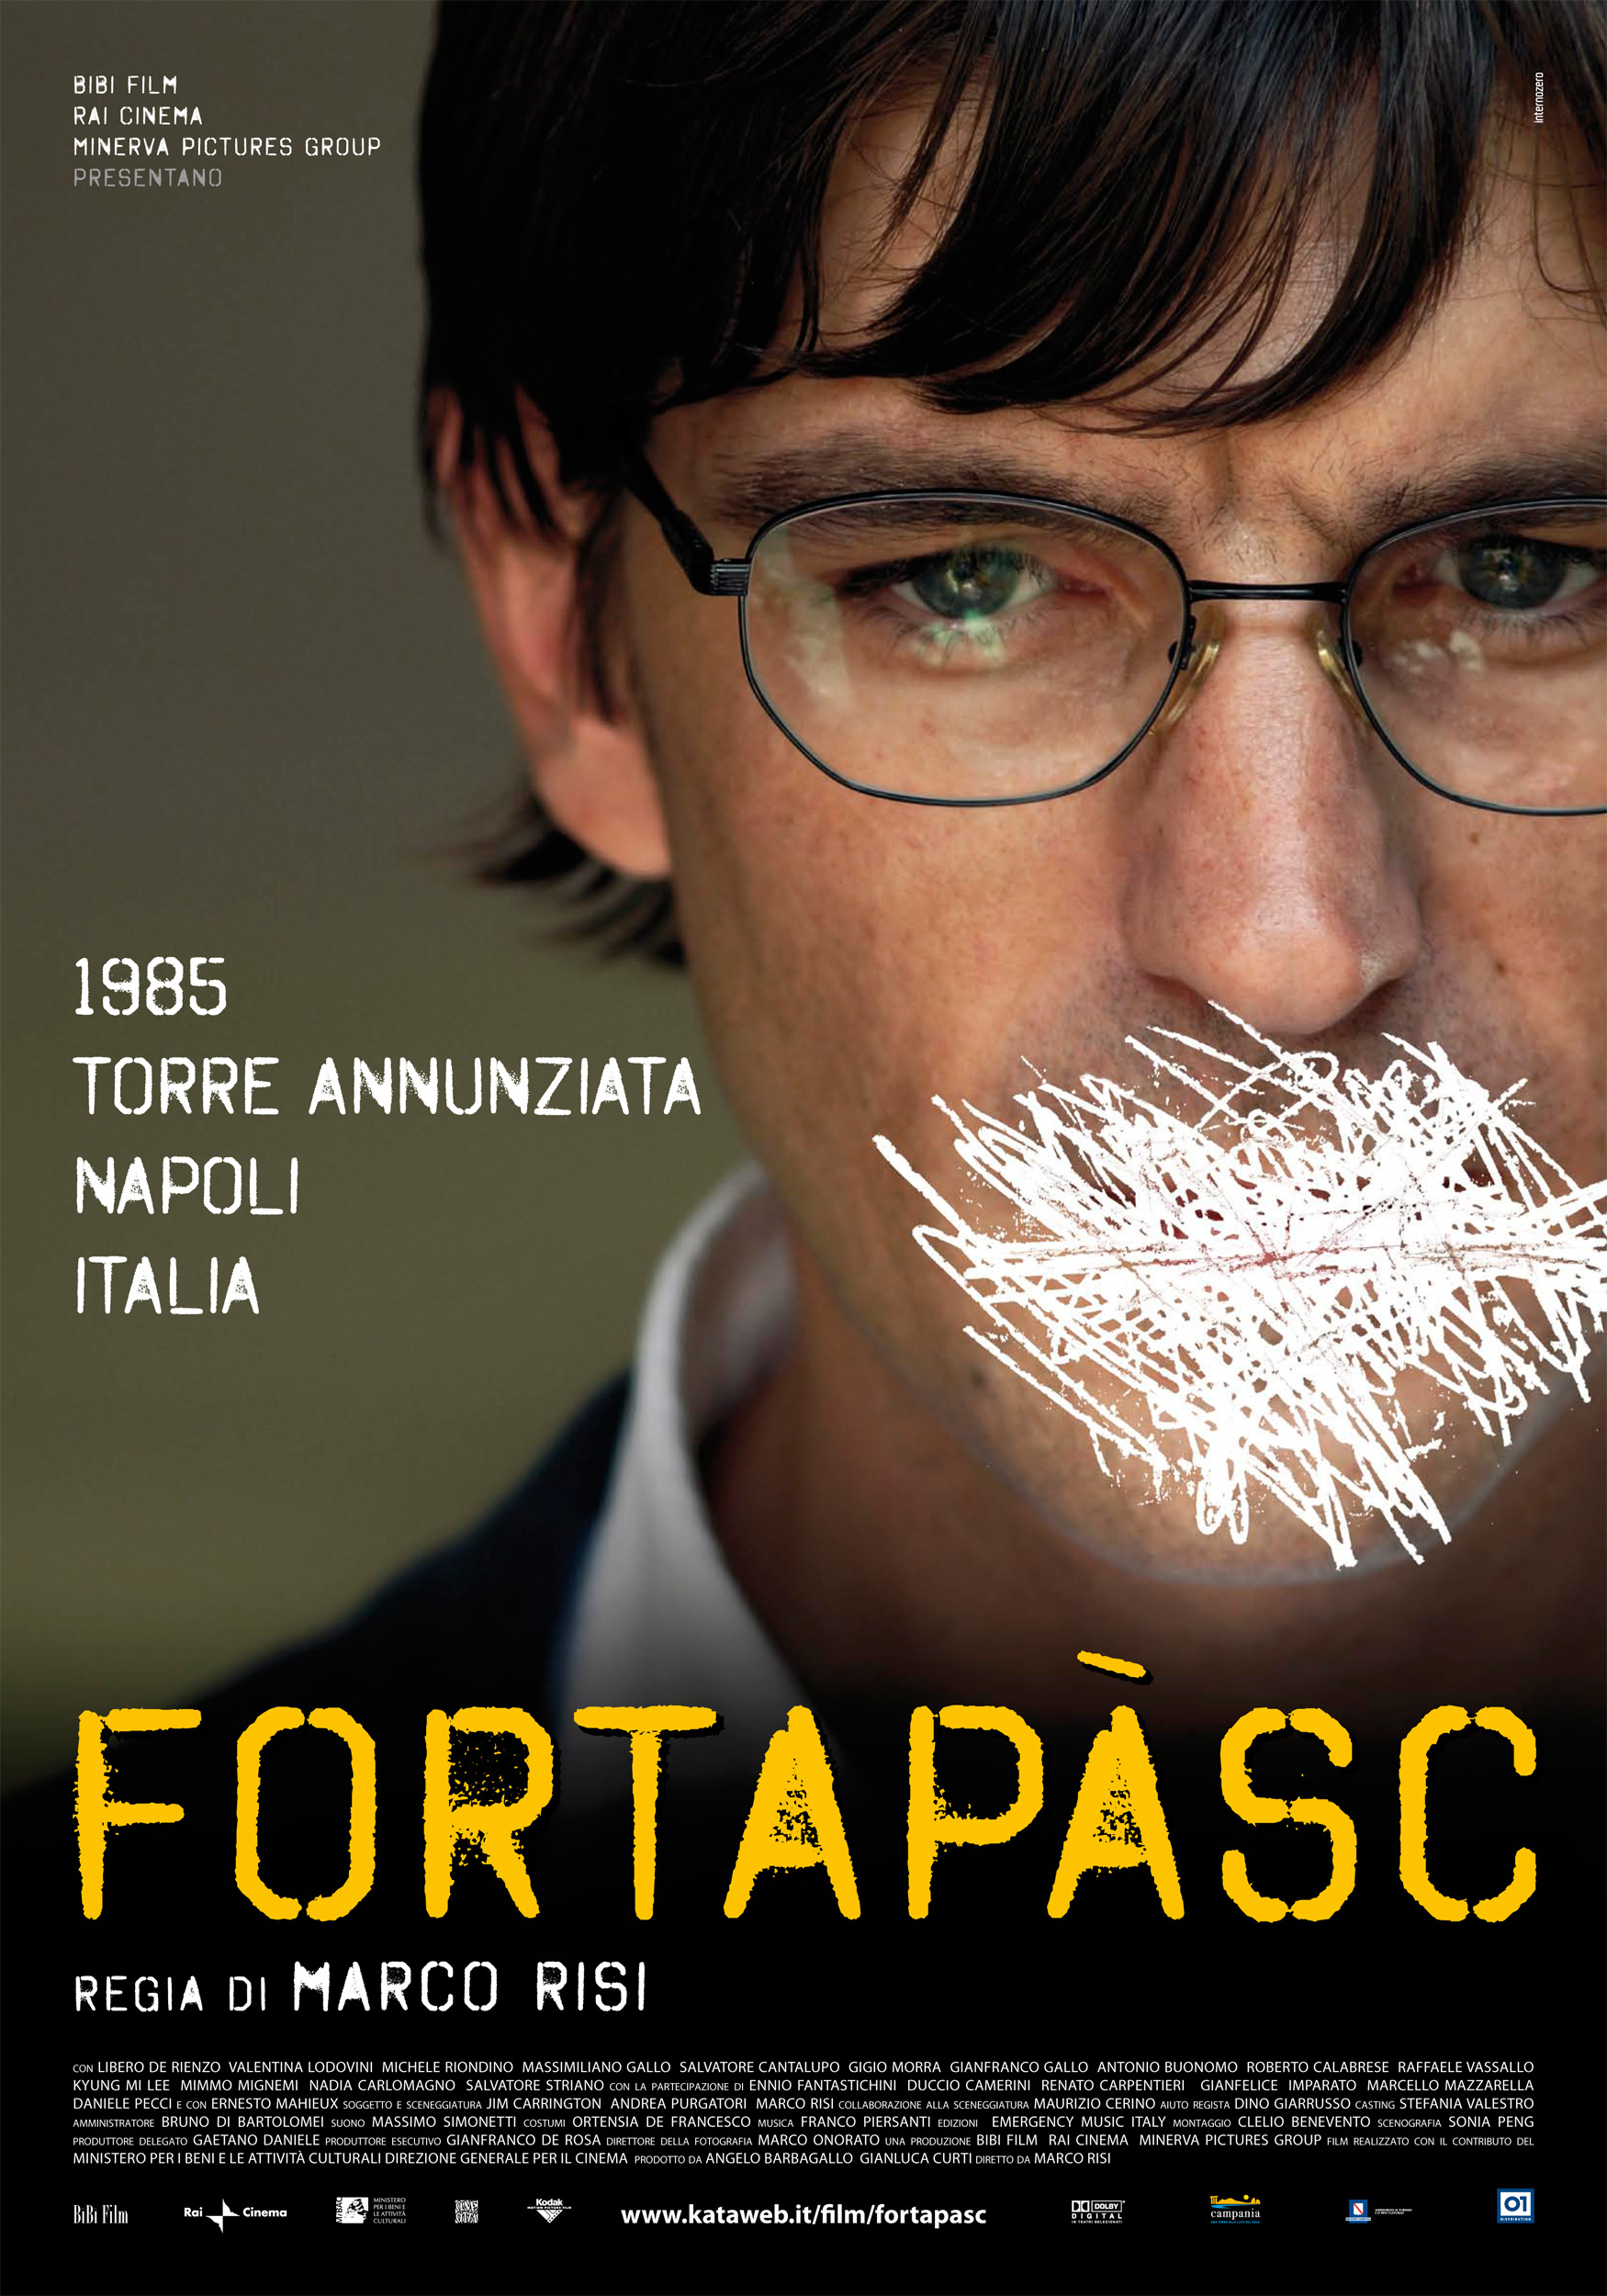 Fortapasc di Marco Risi (2009)